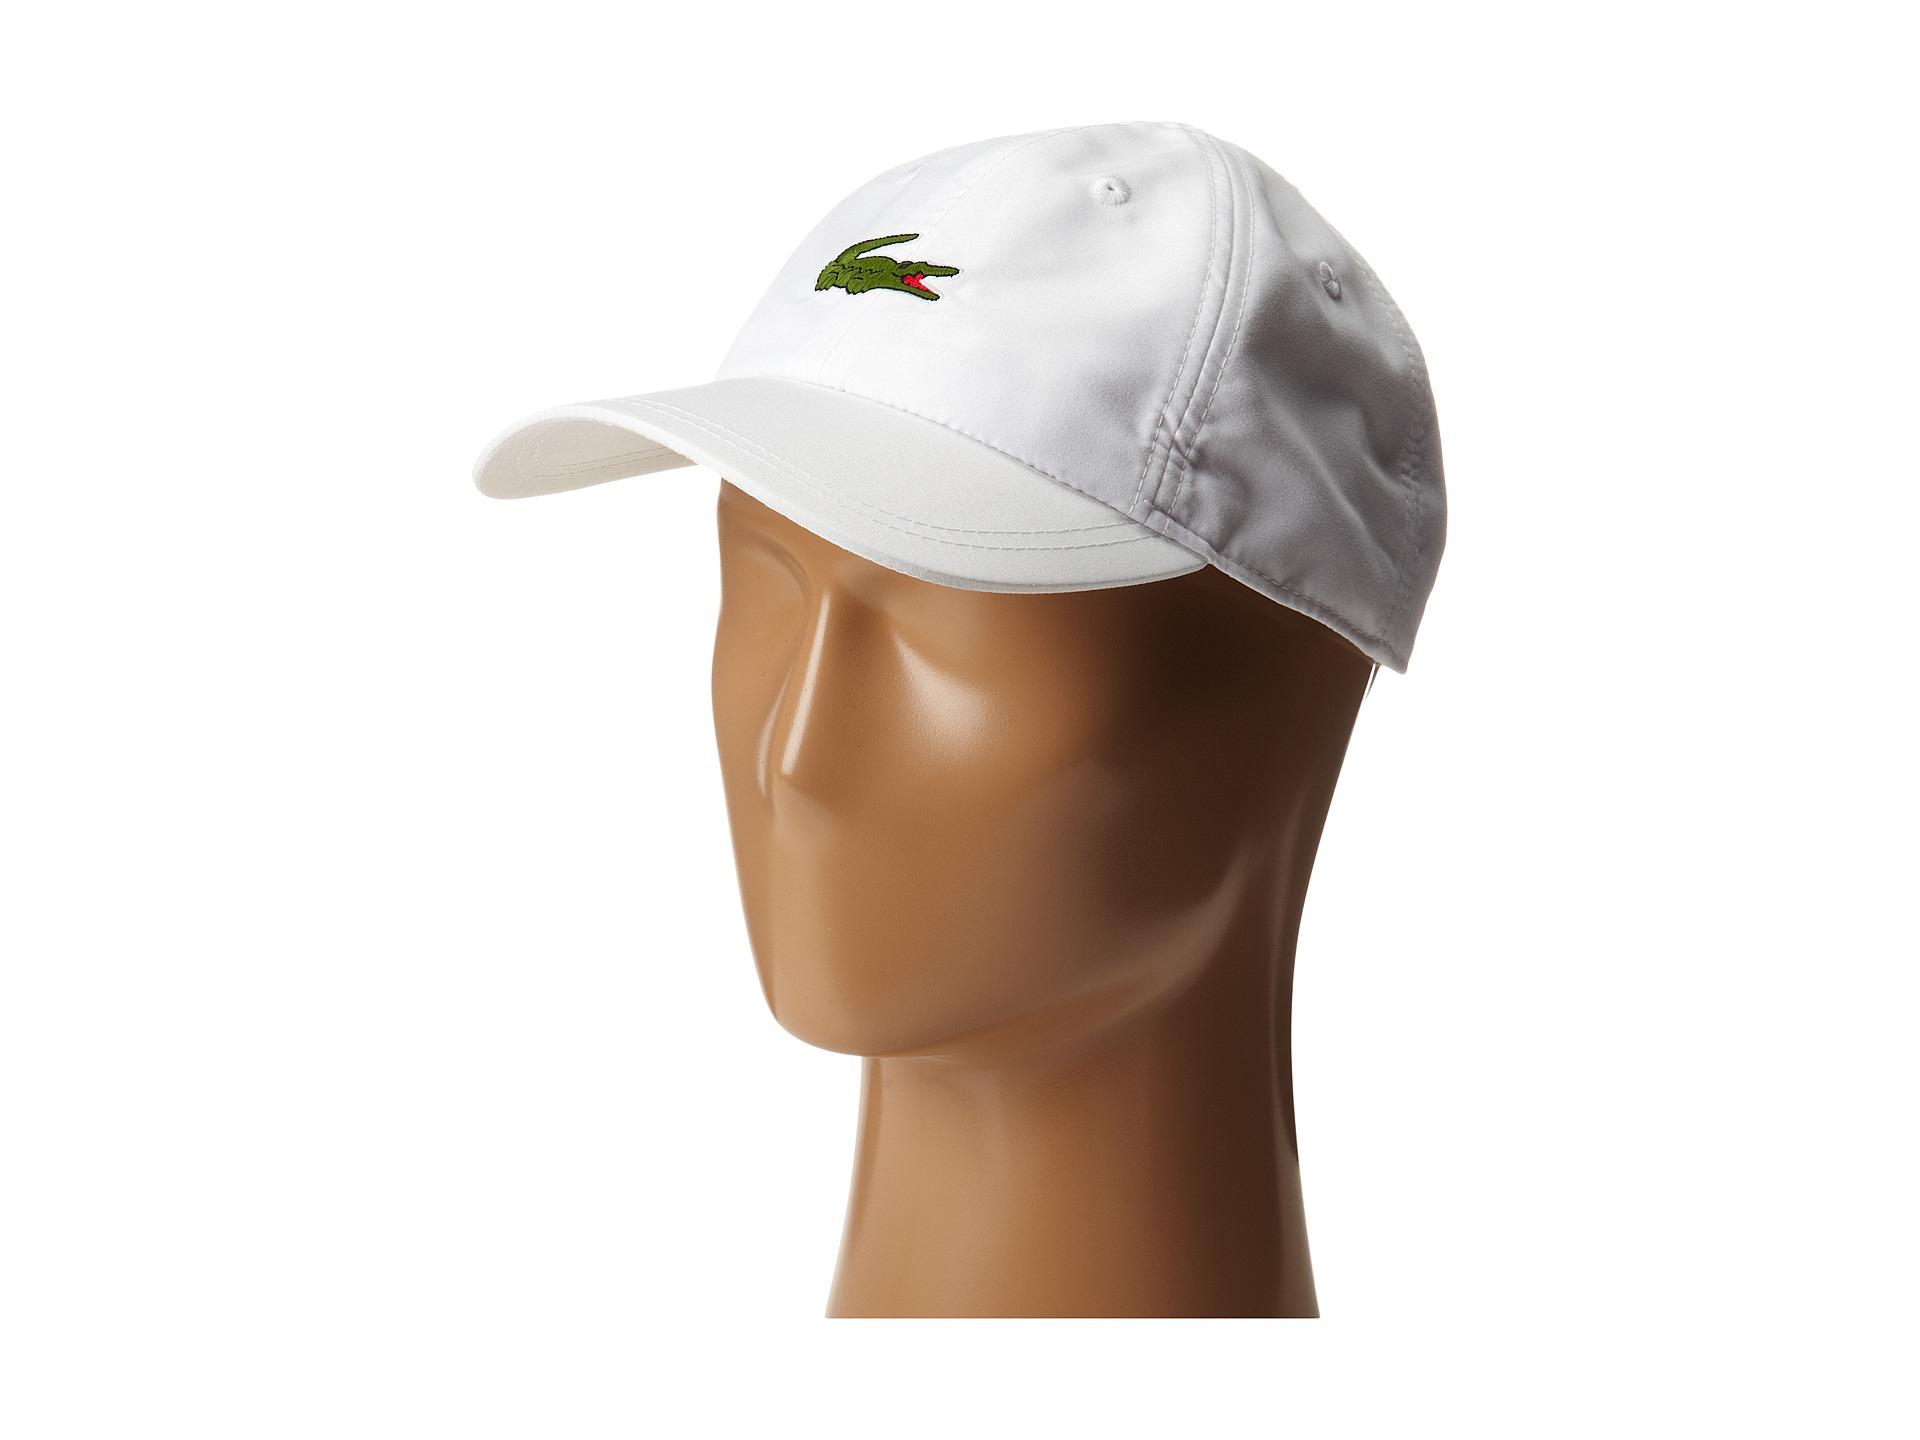 37a47e8746f Lyst - Lacoste Poly 5 Cm Croc Sport Cap in White for Men